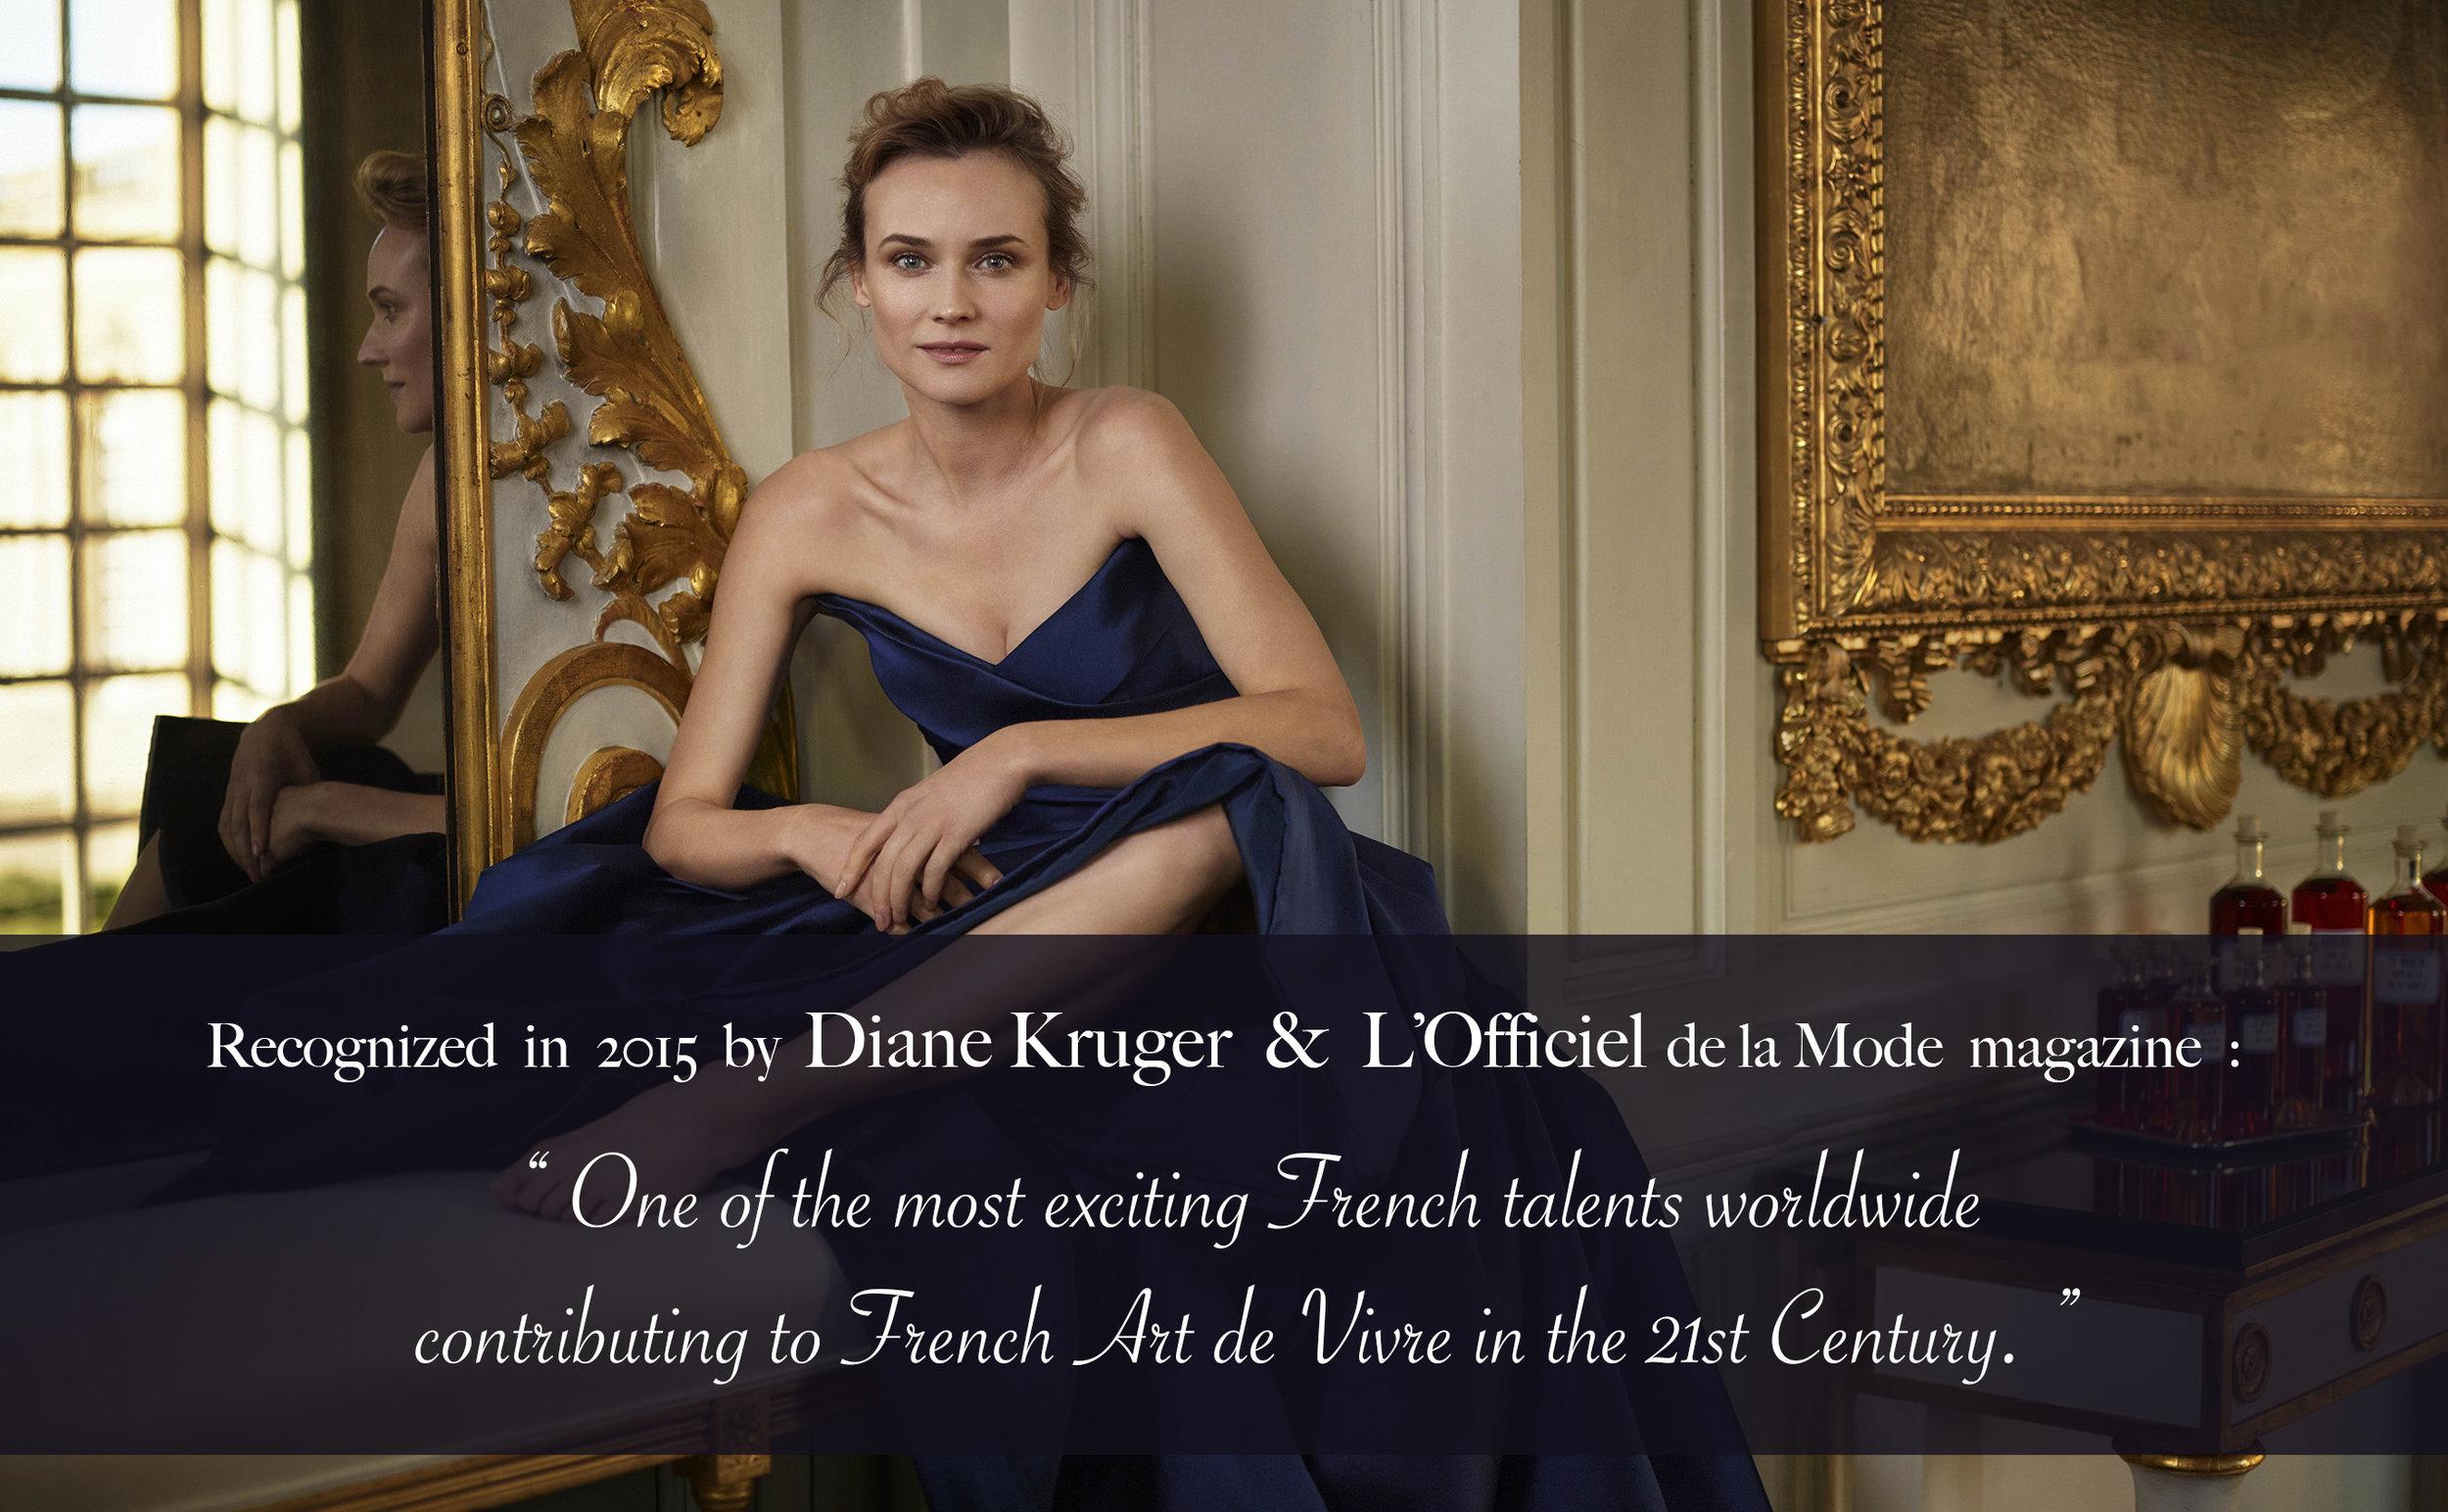 diane_kruger_la_fiancee_du_facteur_fashion_mode_jewelry_banner.jpg